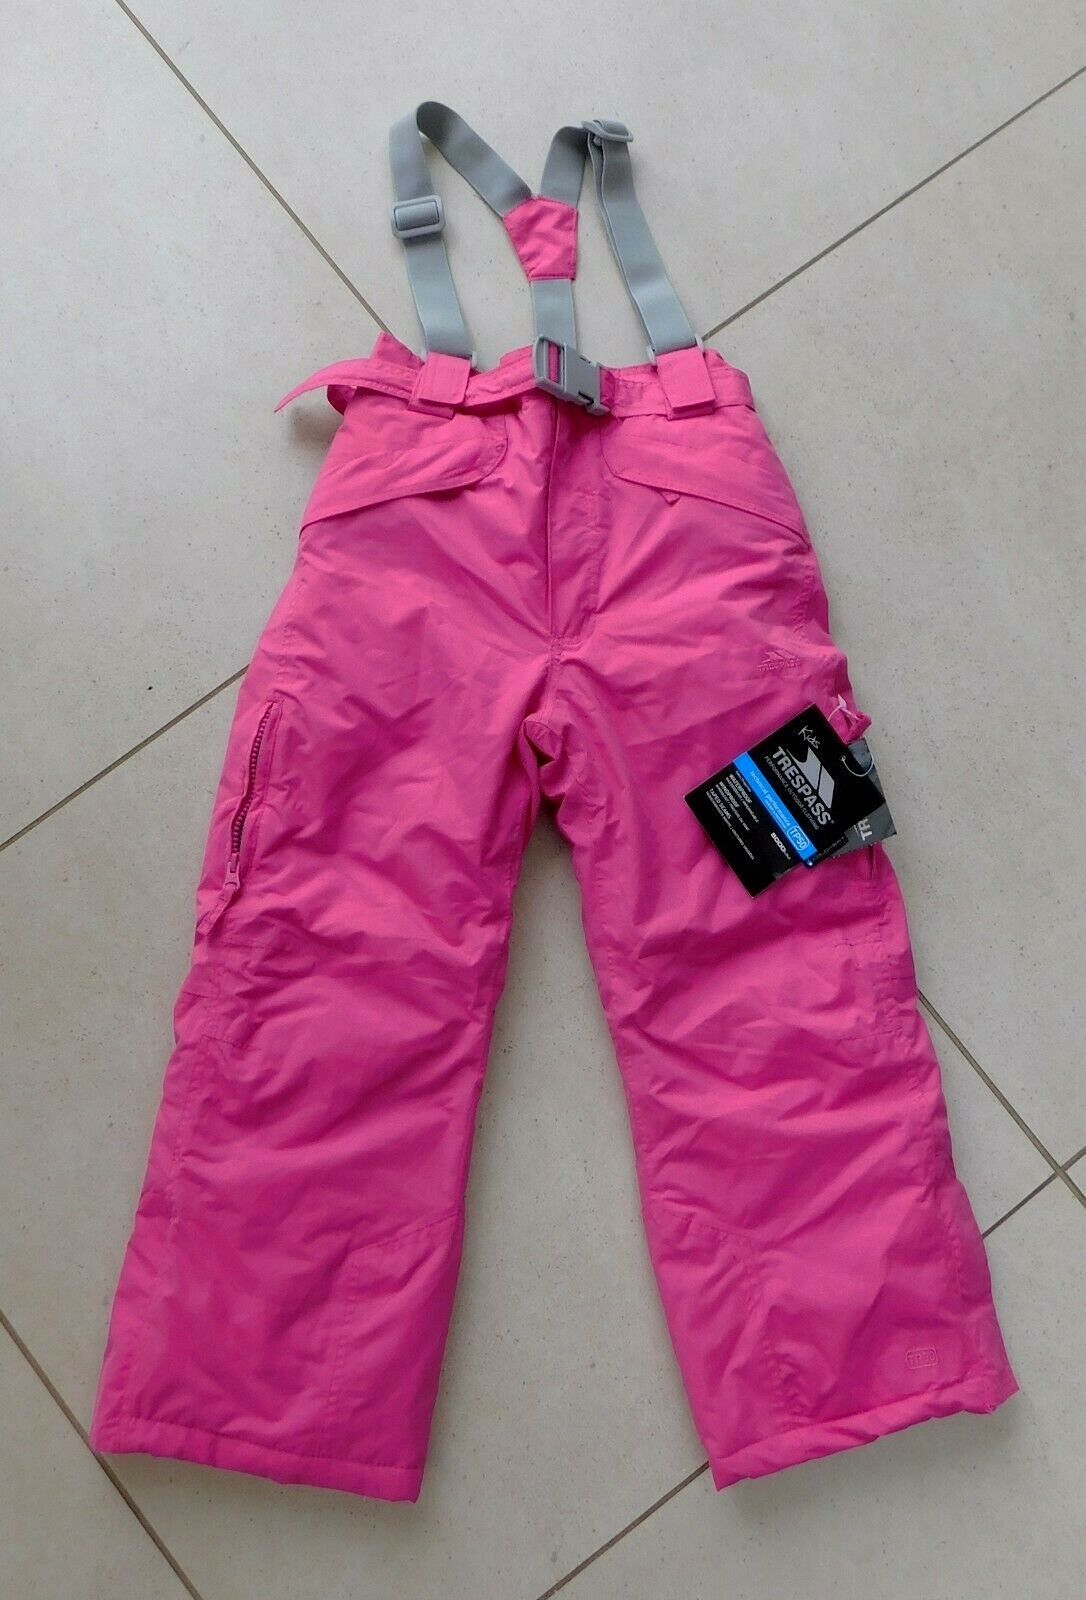 TRESSPASS Kids Girls 'MARVELOUS' Ski Salopettes Bubblegum Pink - age 5 6 BNWT